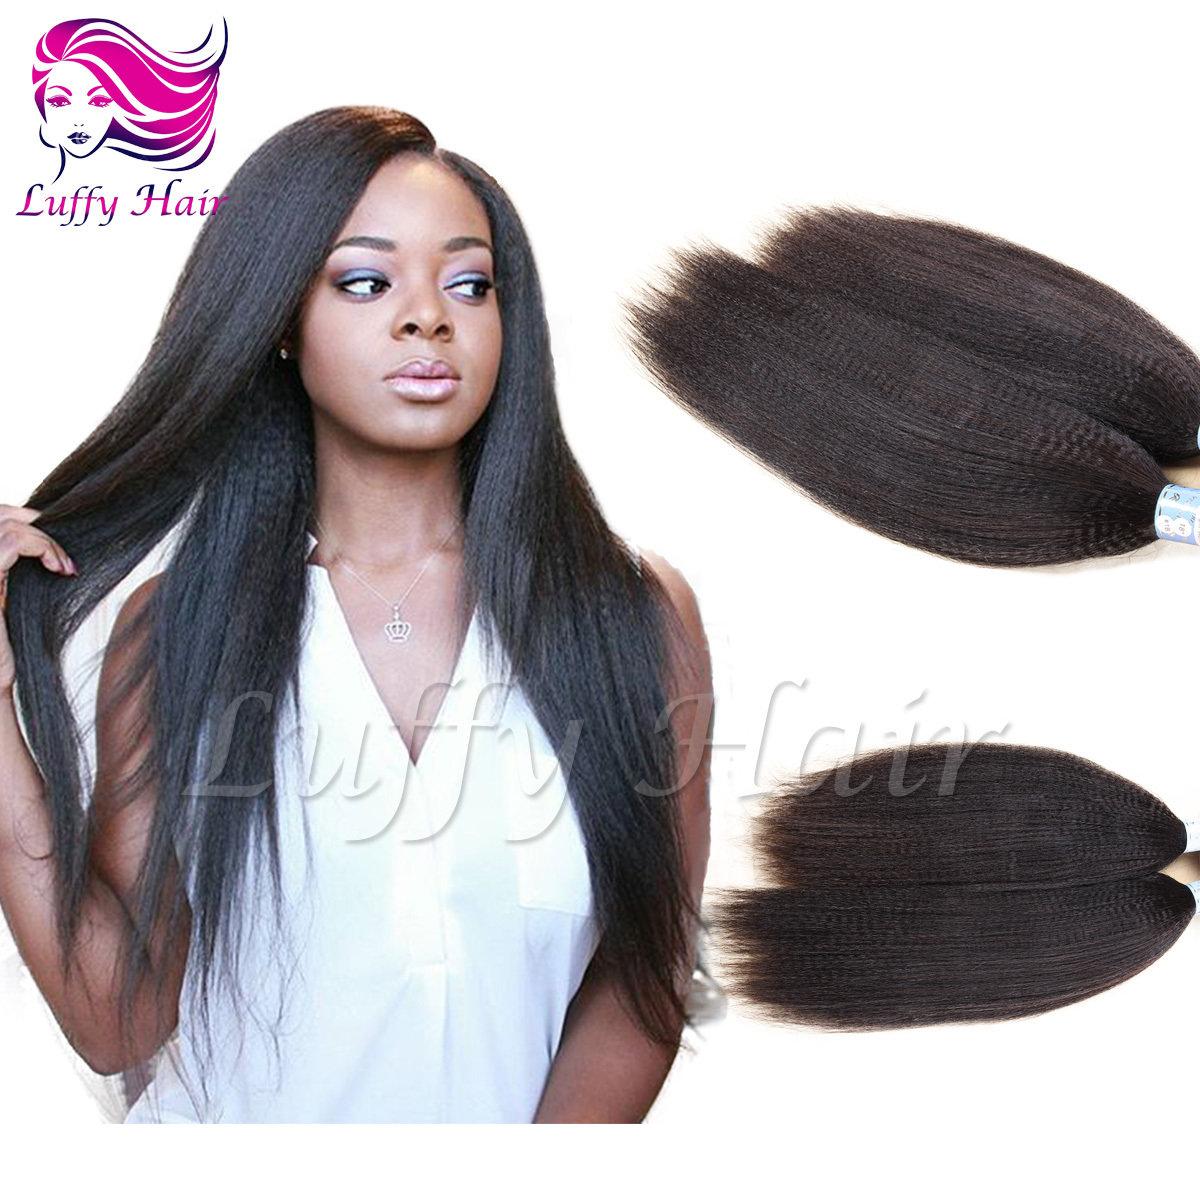 8A Virgin Human Hair Italian Yaki Straight Braiding Hair Bulk - KBL013